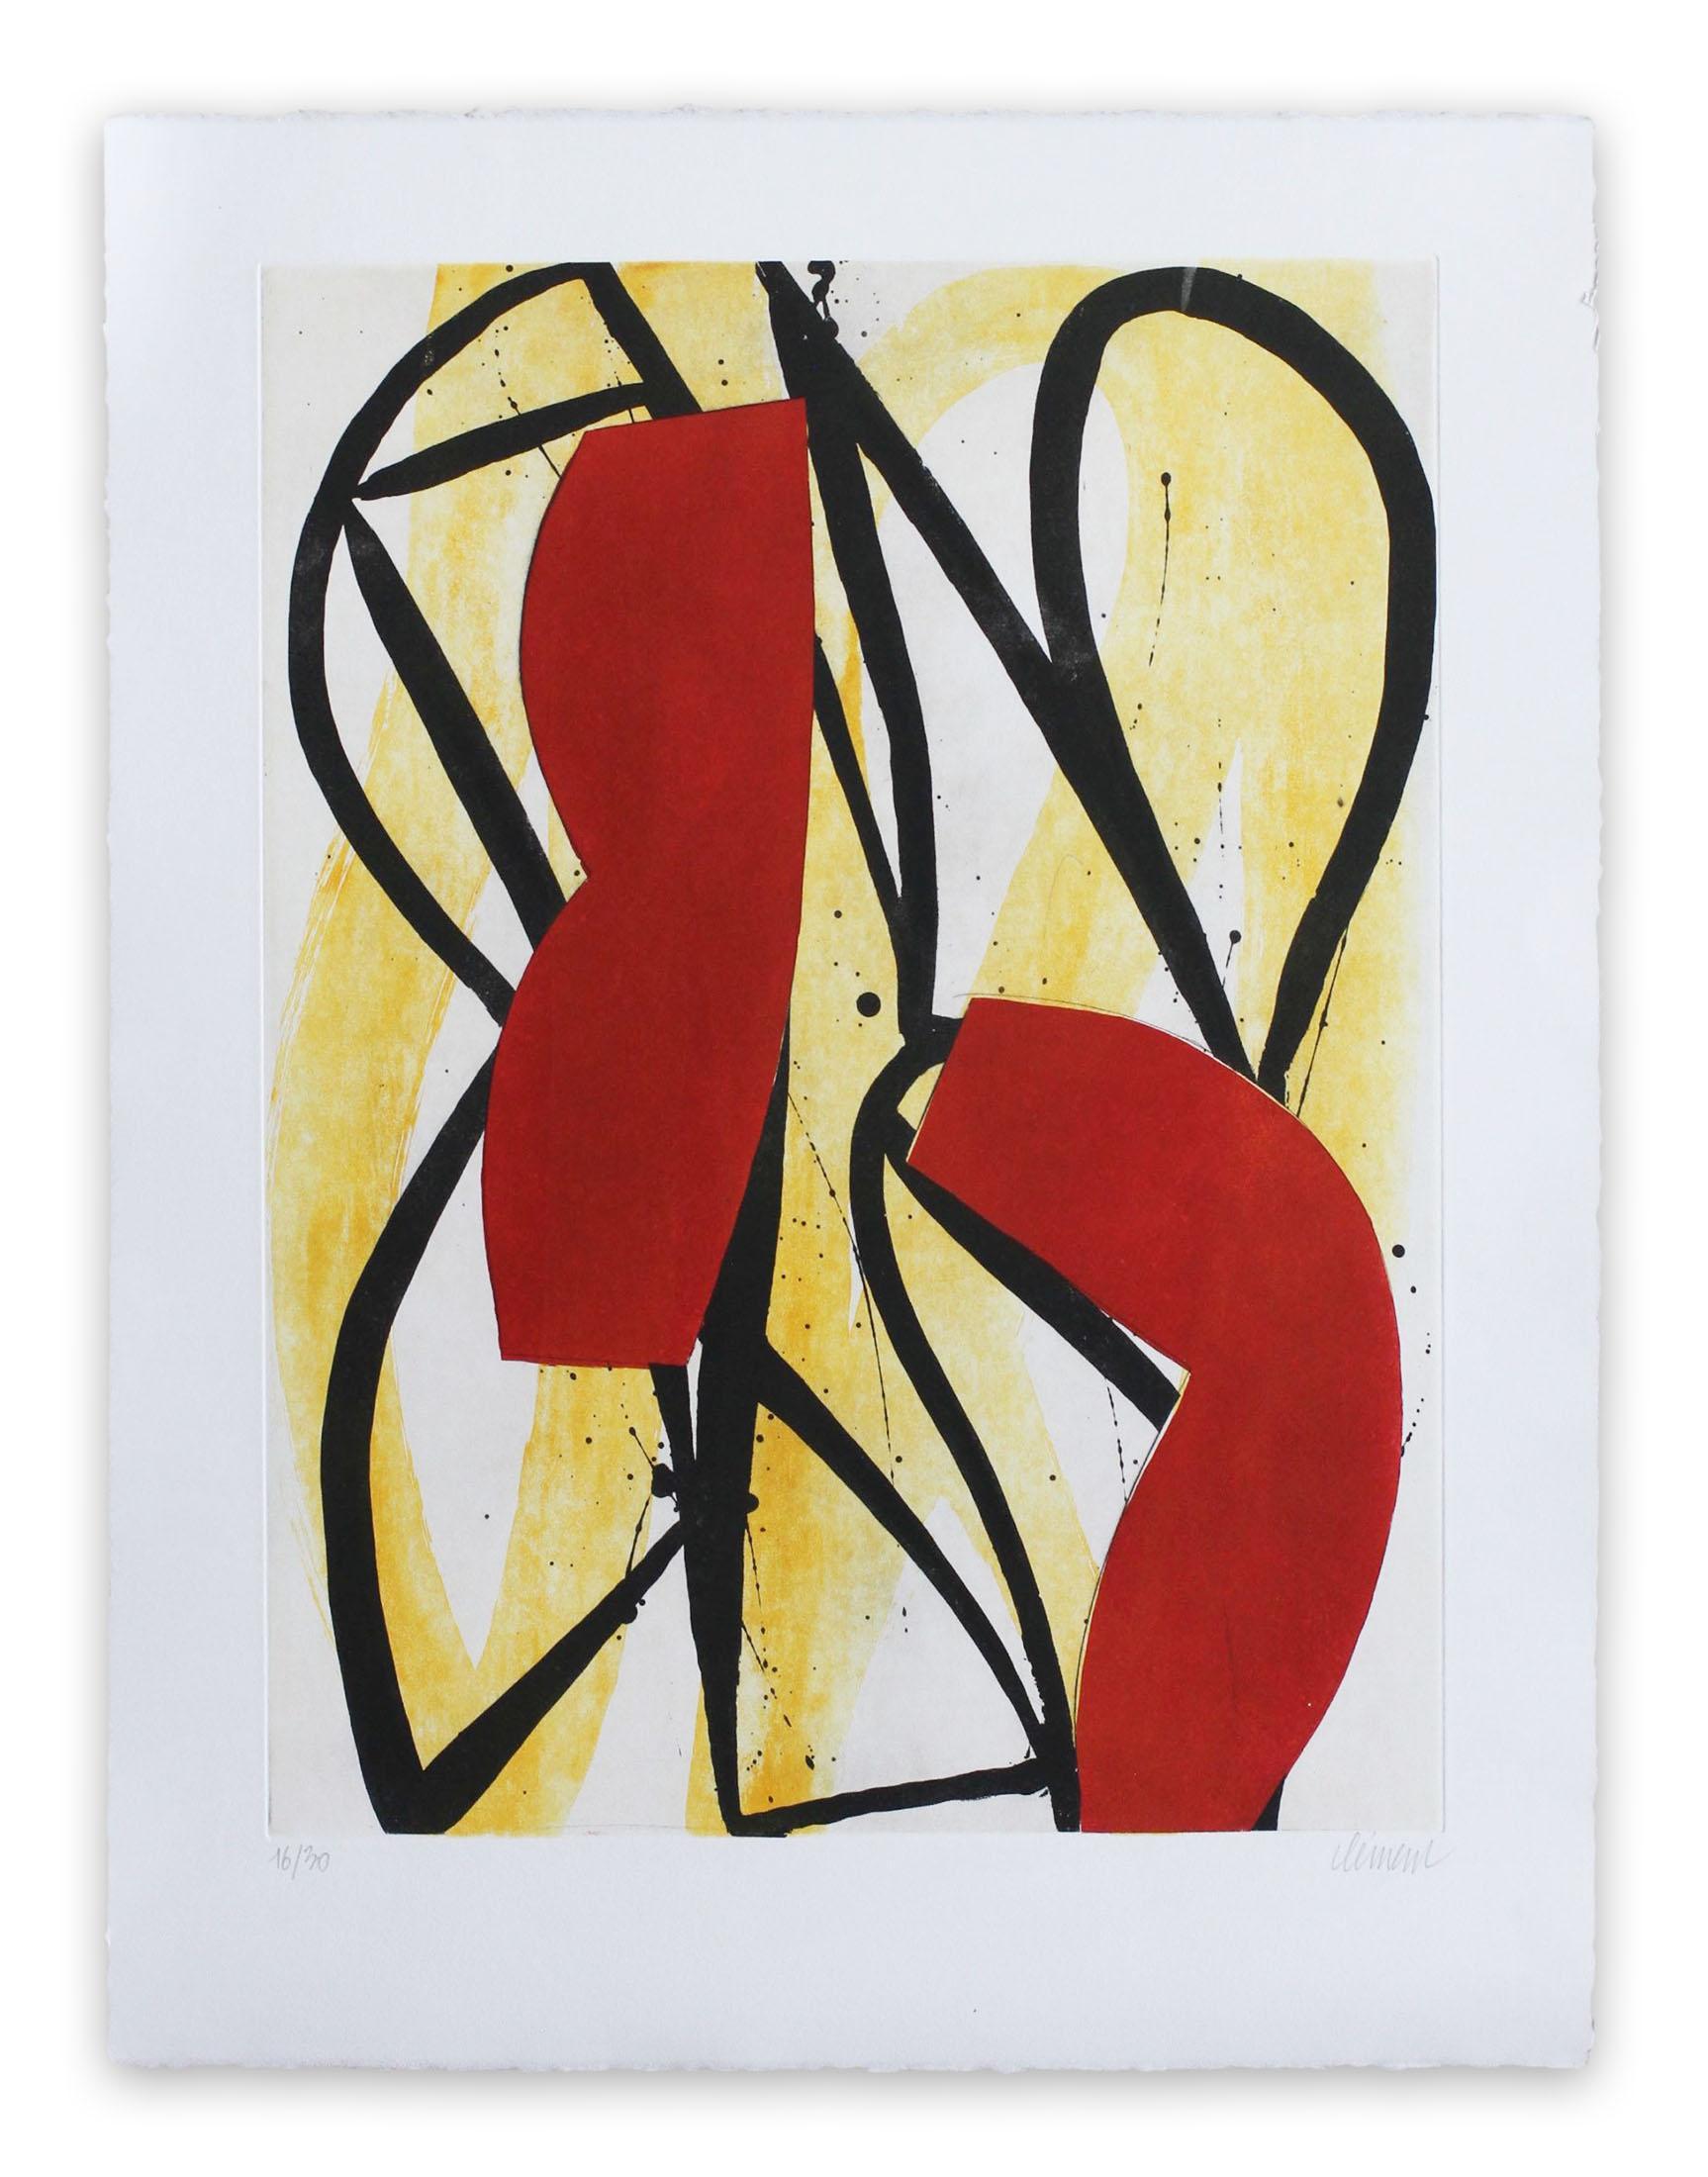 13F2G-2013 (Abstract print)